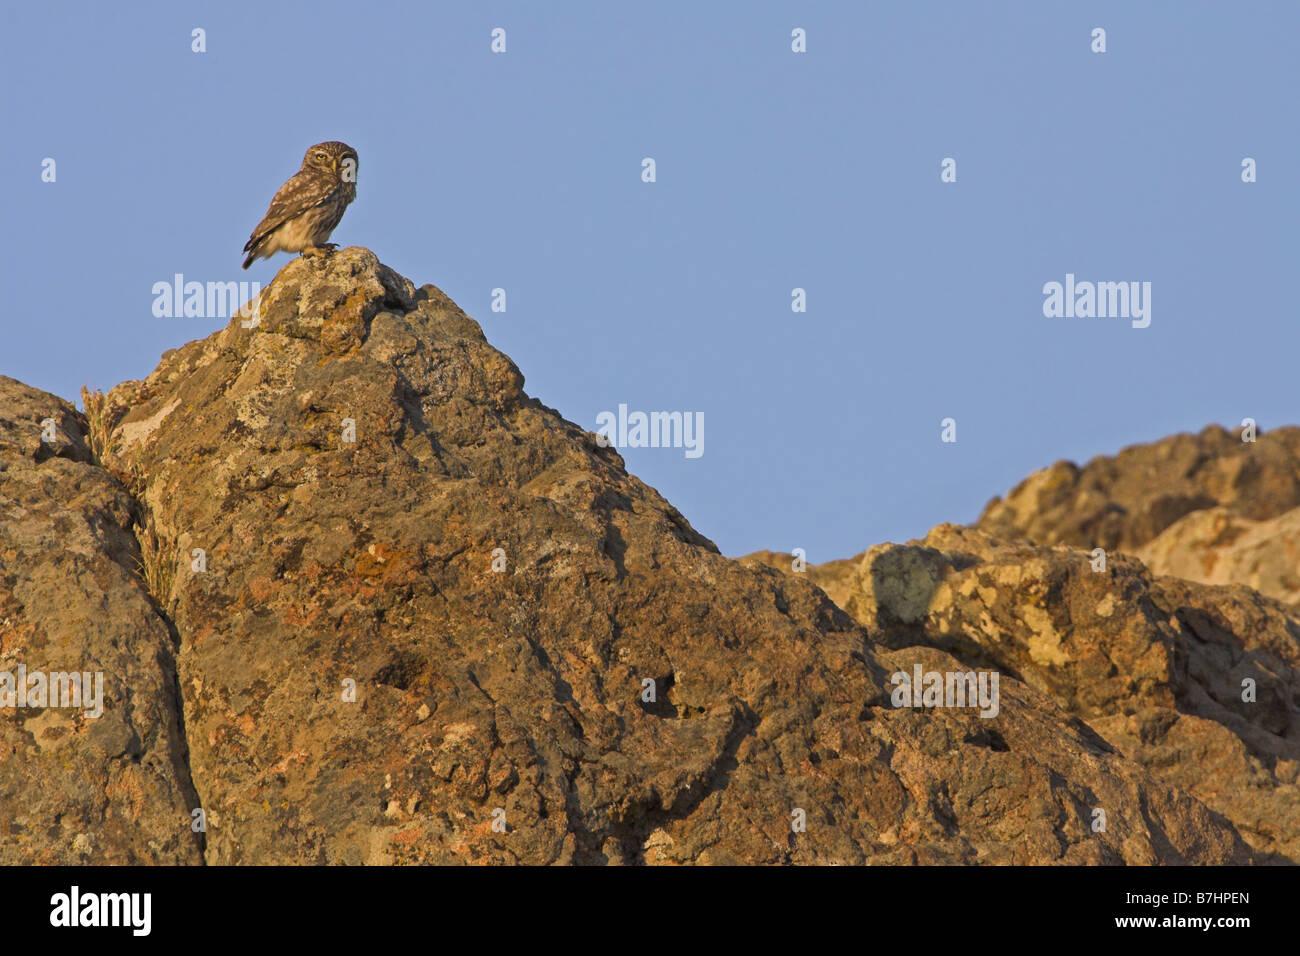 little owl (Athene noctua), sitting on a rock, Greece, Lesbos - Stock Image